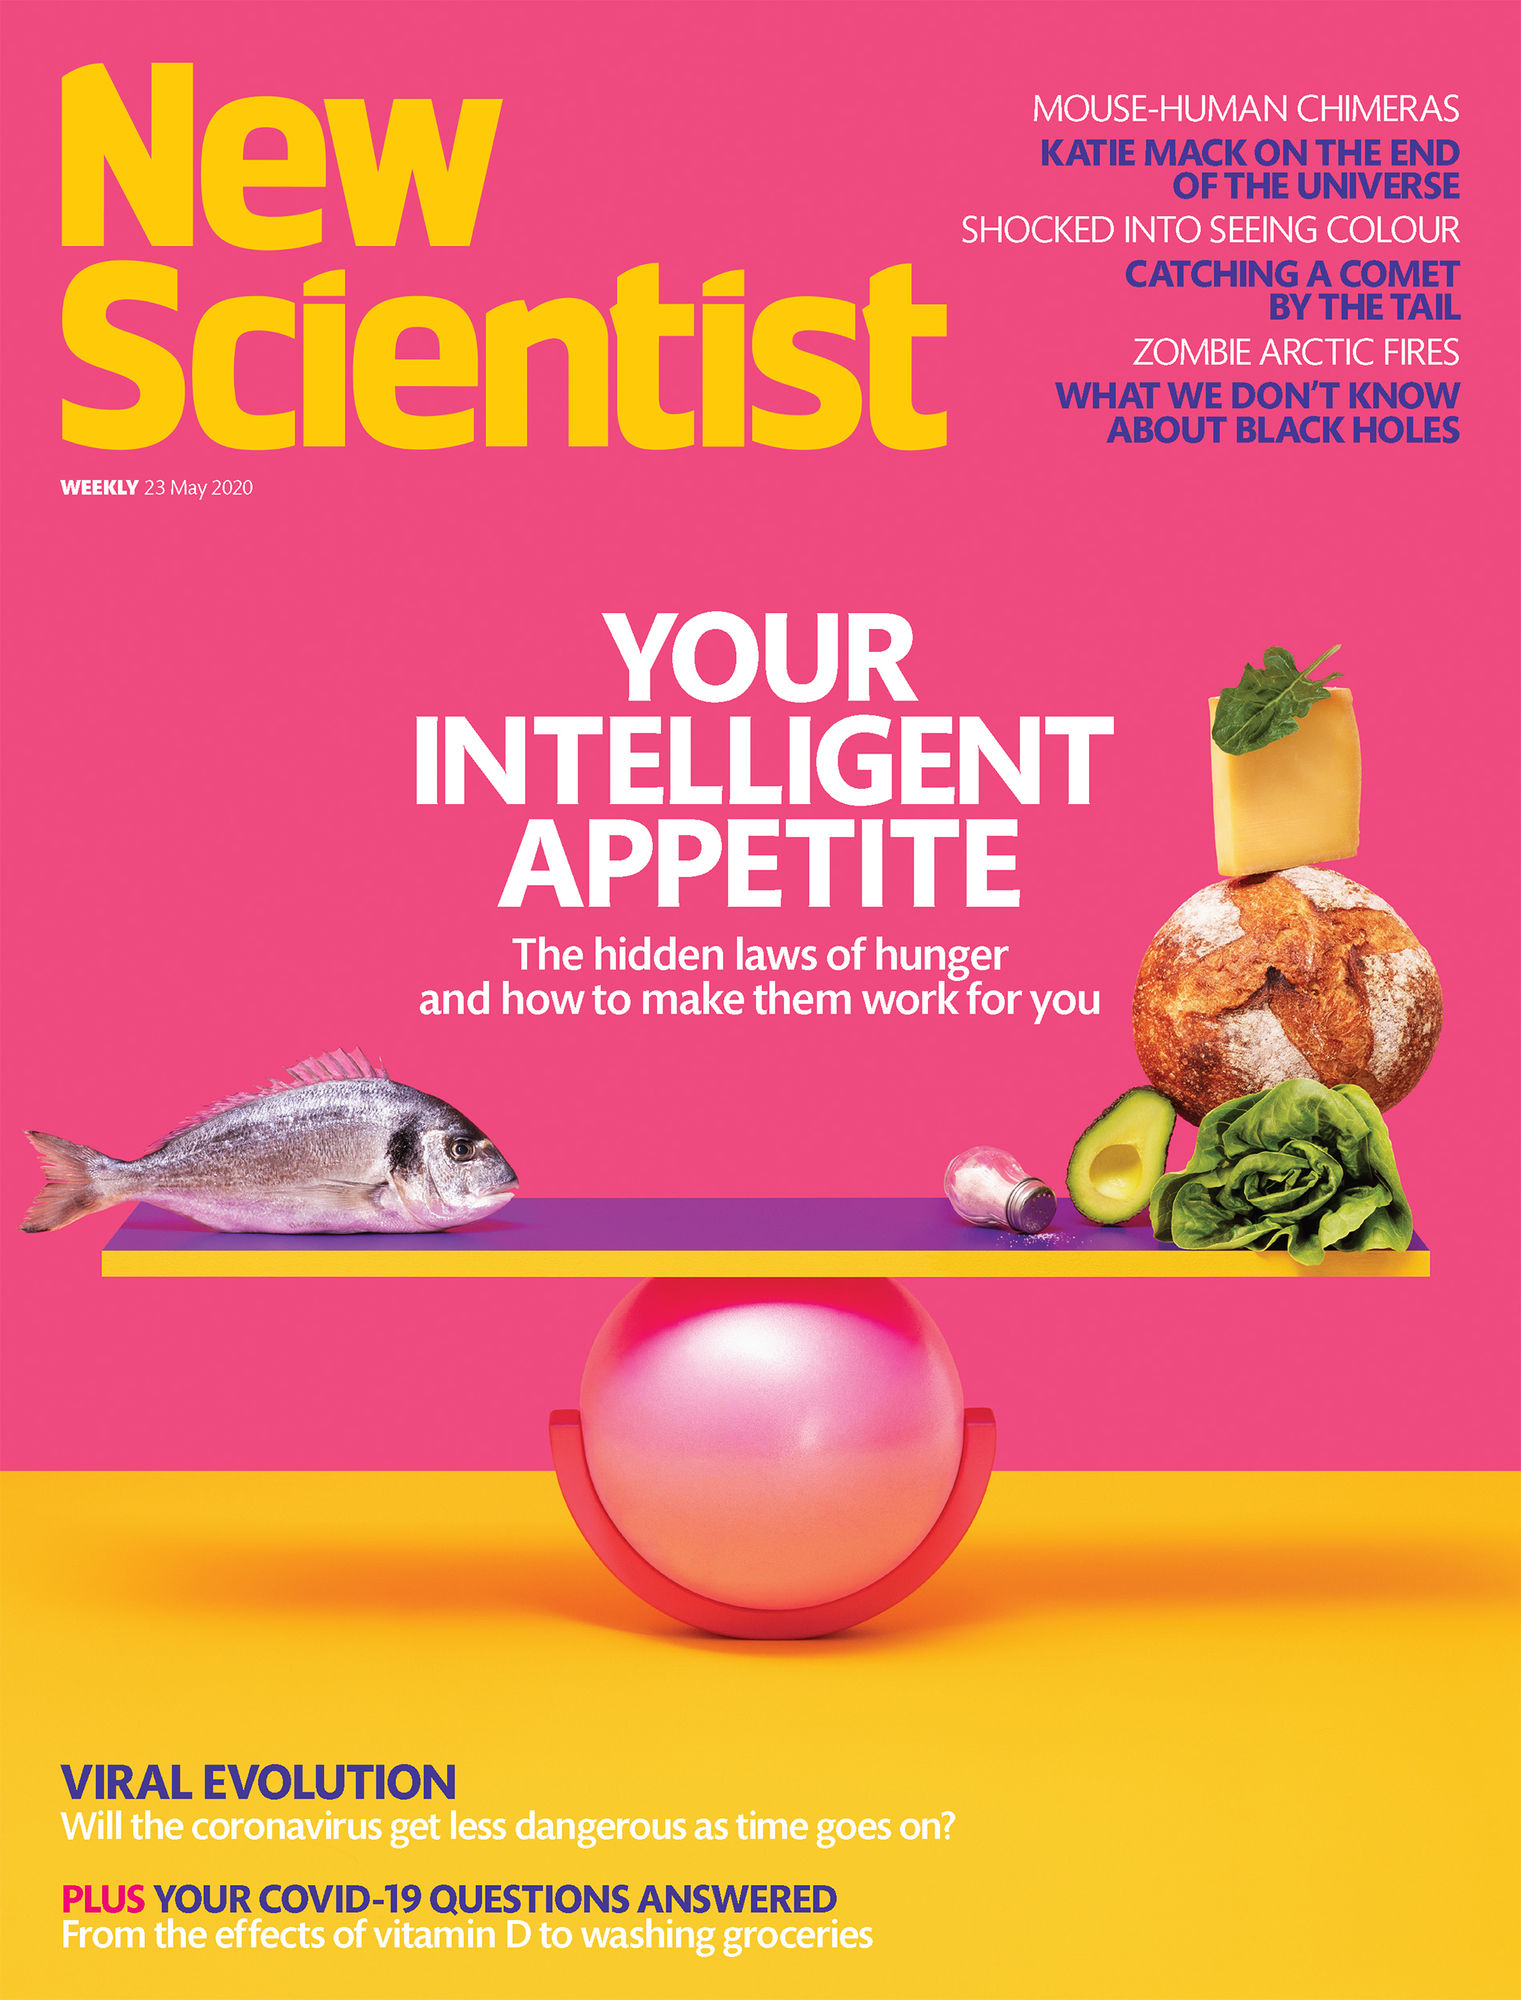 COSMOPOLA GMBH - ILKA & FRANZ for New Scientist - Pump it up!